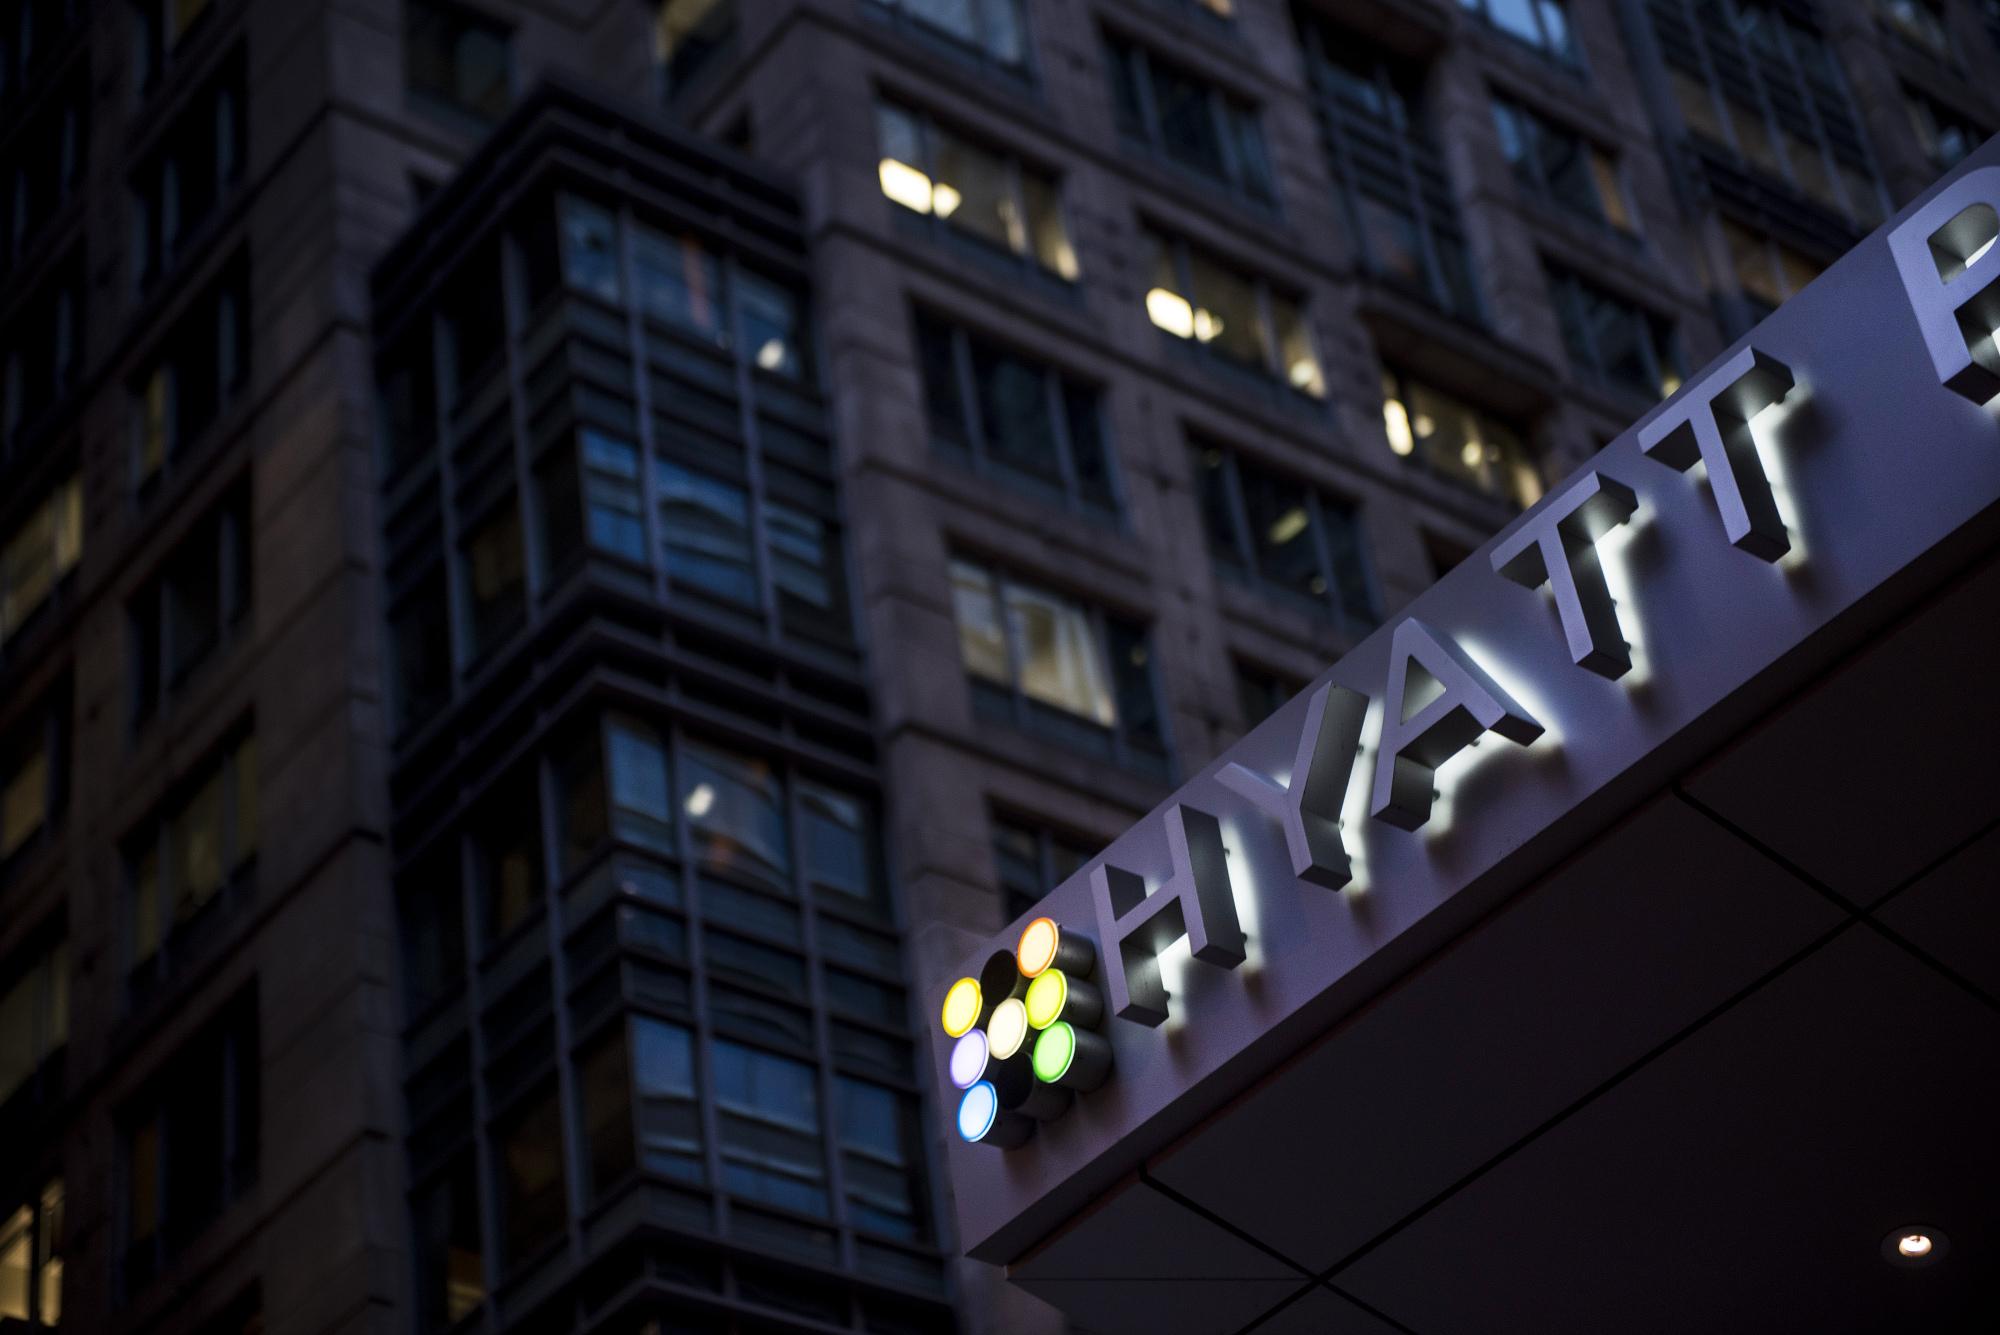 Hnew York Stock Quote Hyatt Hotels Corp Bloomberg Markets